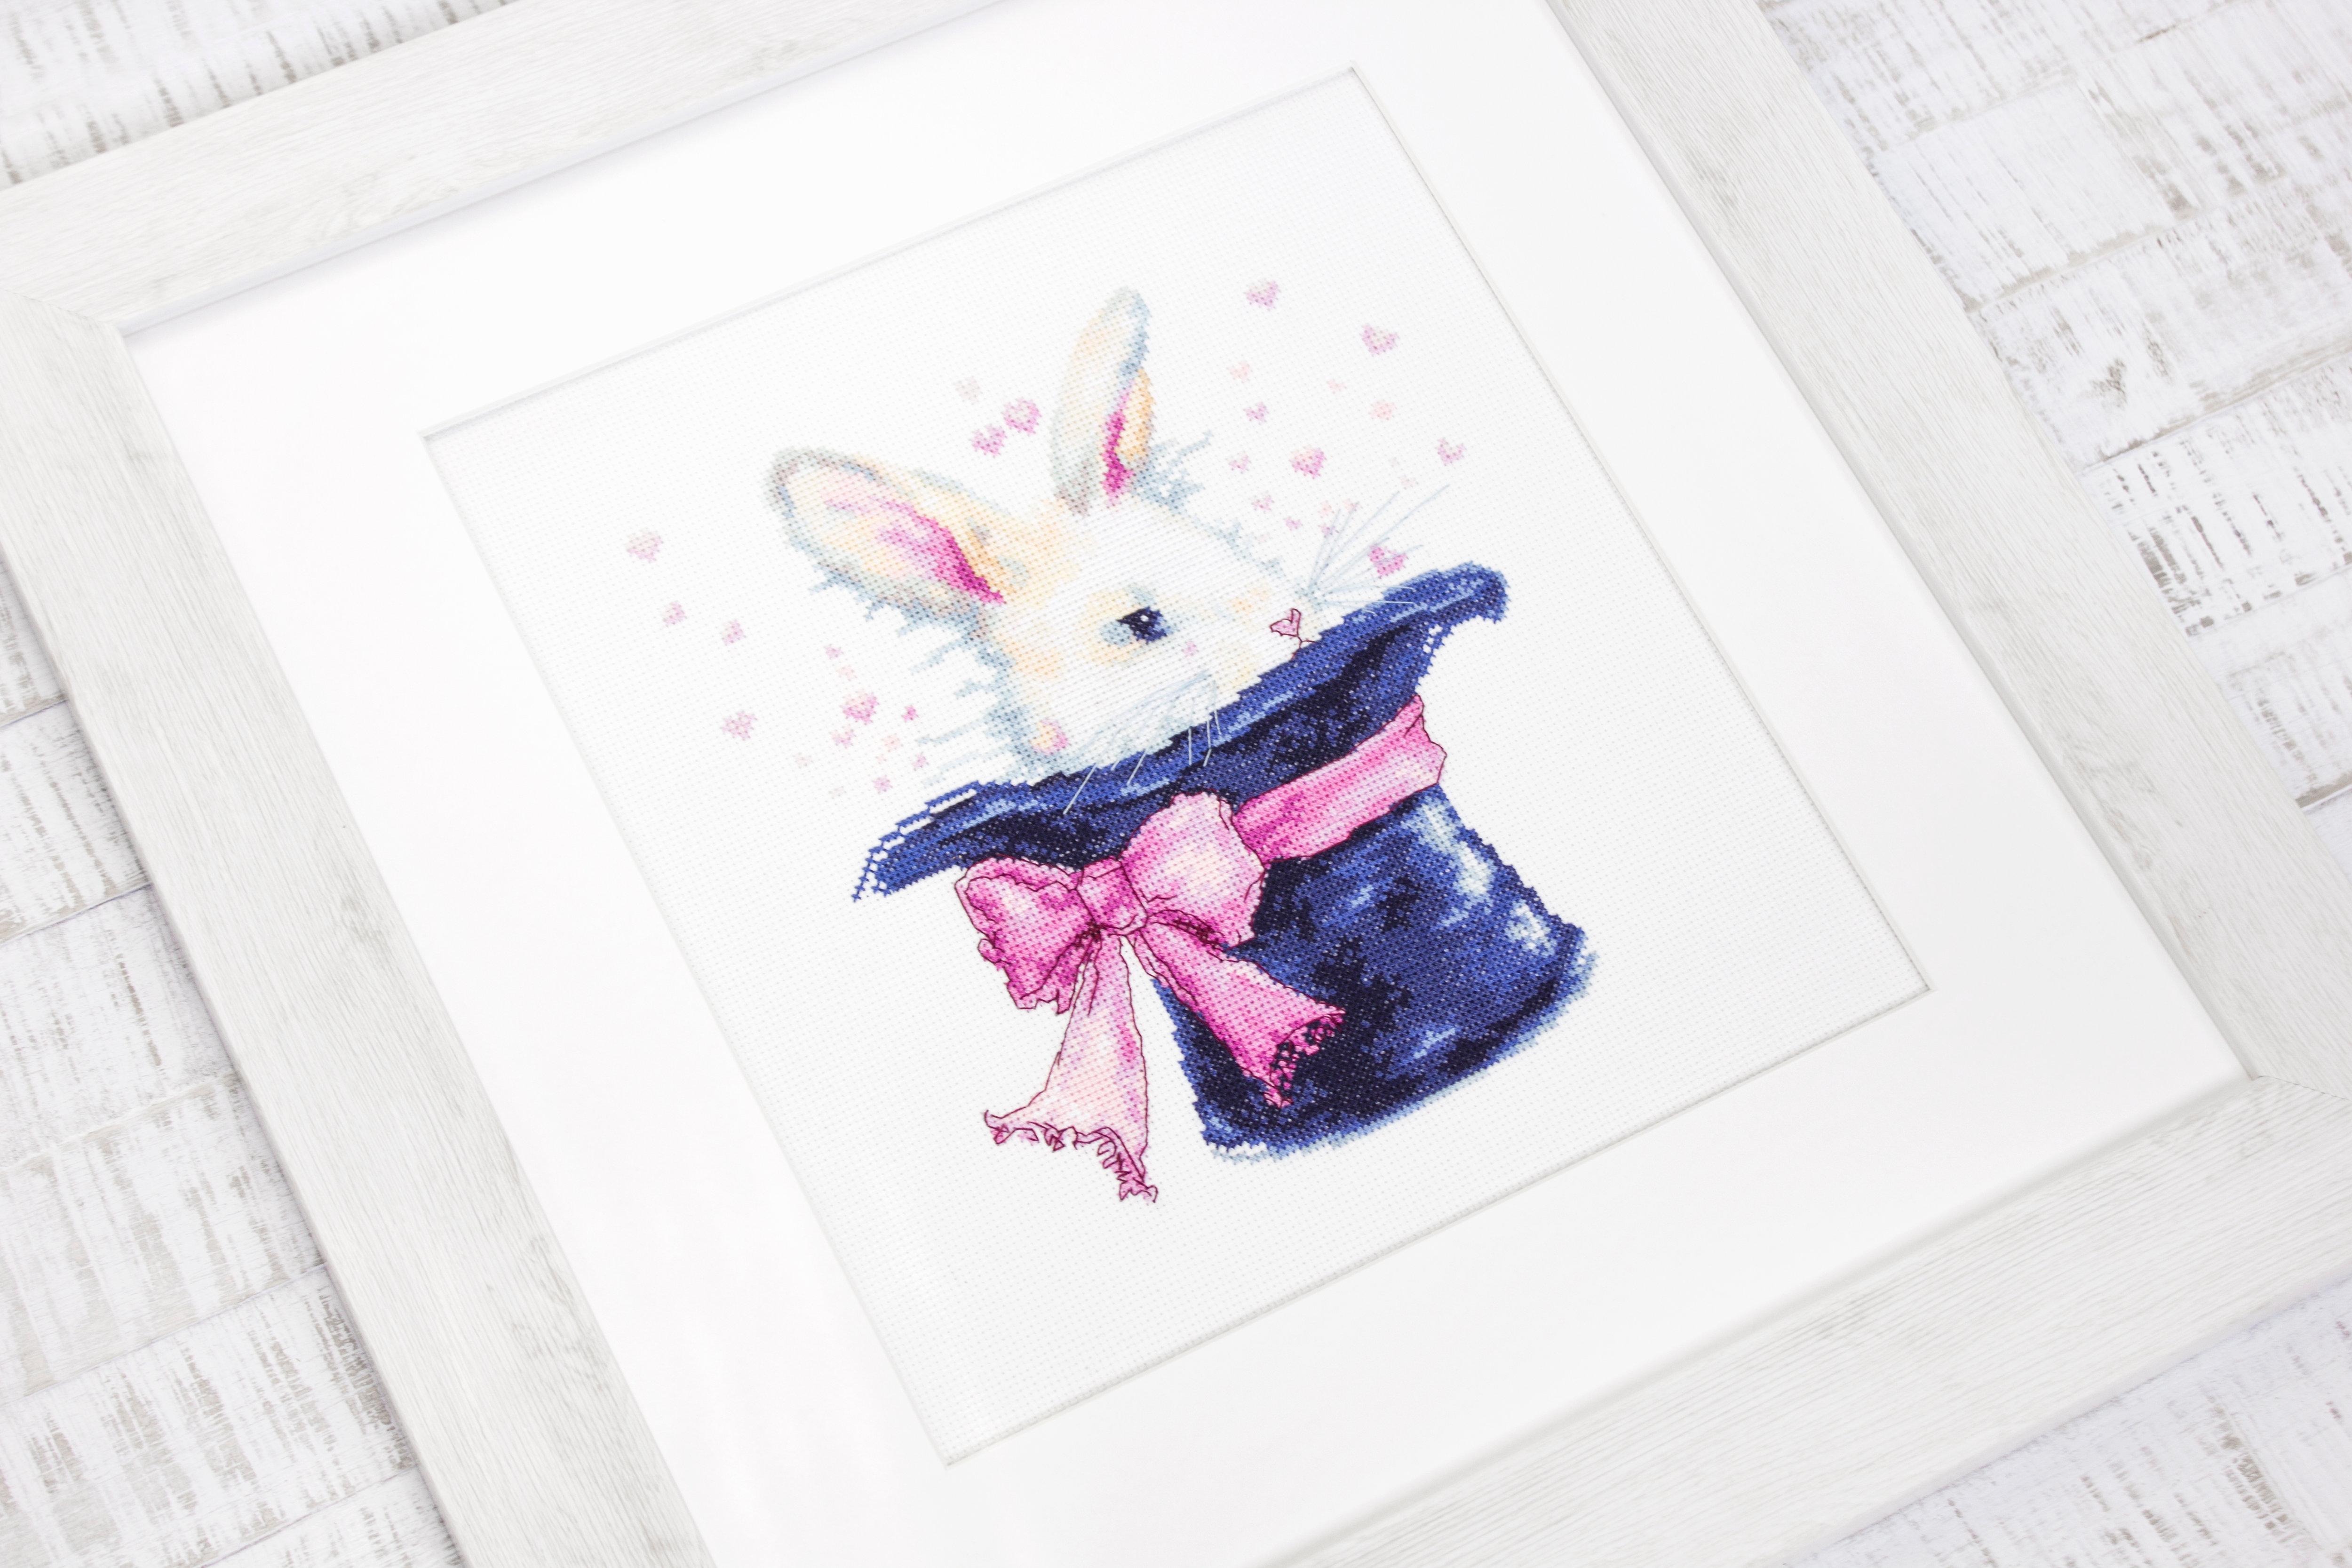 Luca-S  B2302 Rabbit \u00a9Alena Dabrynina  Cross Stitch Kit